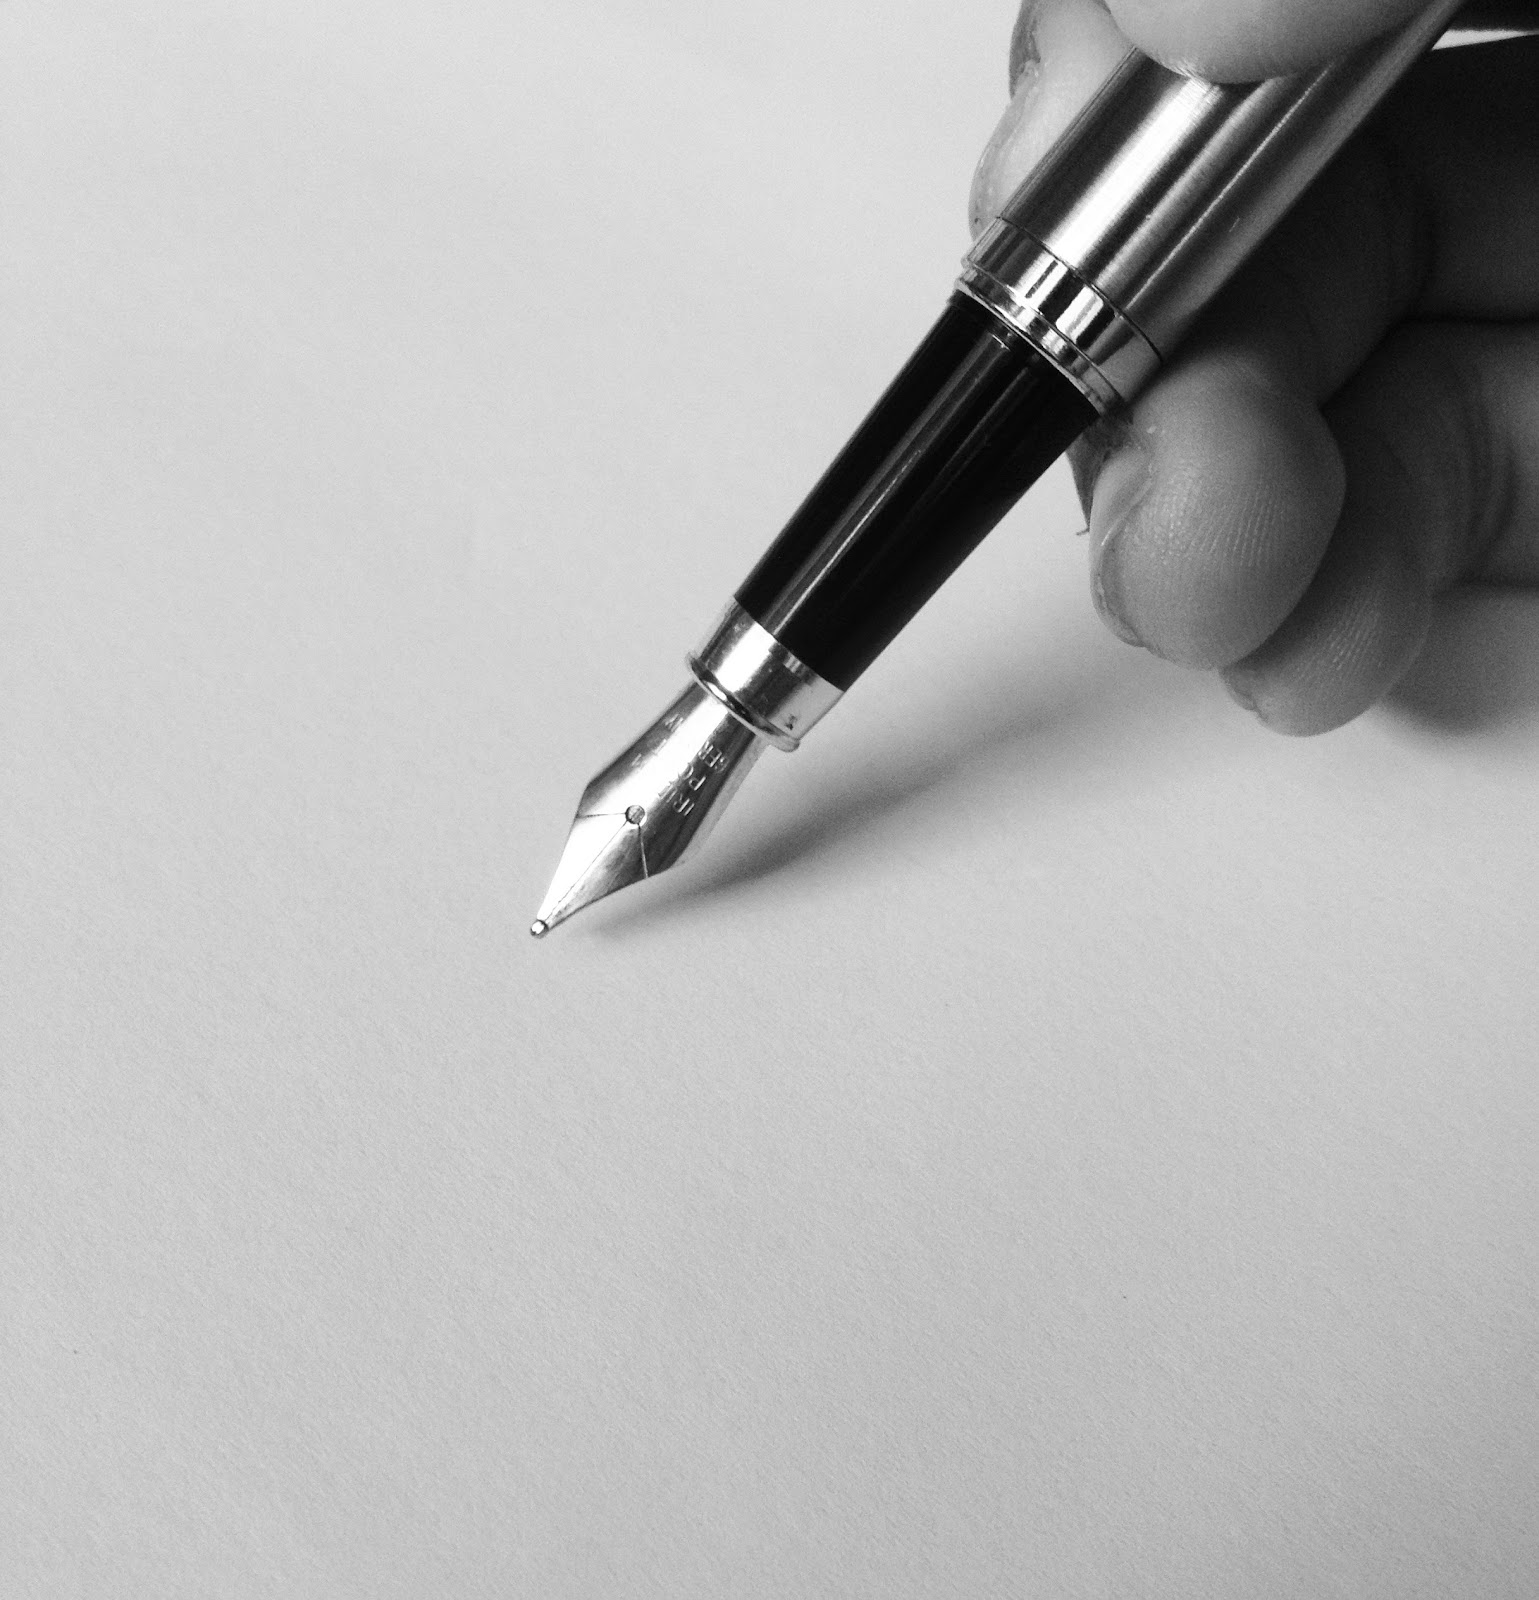 Writing blog articles to make money.